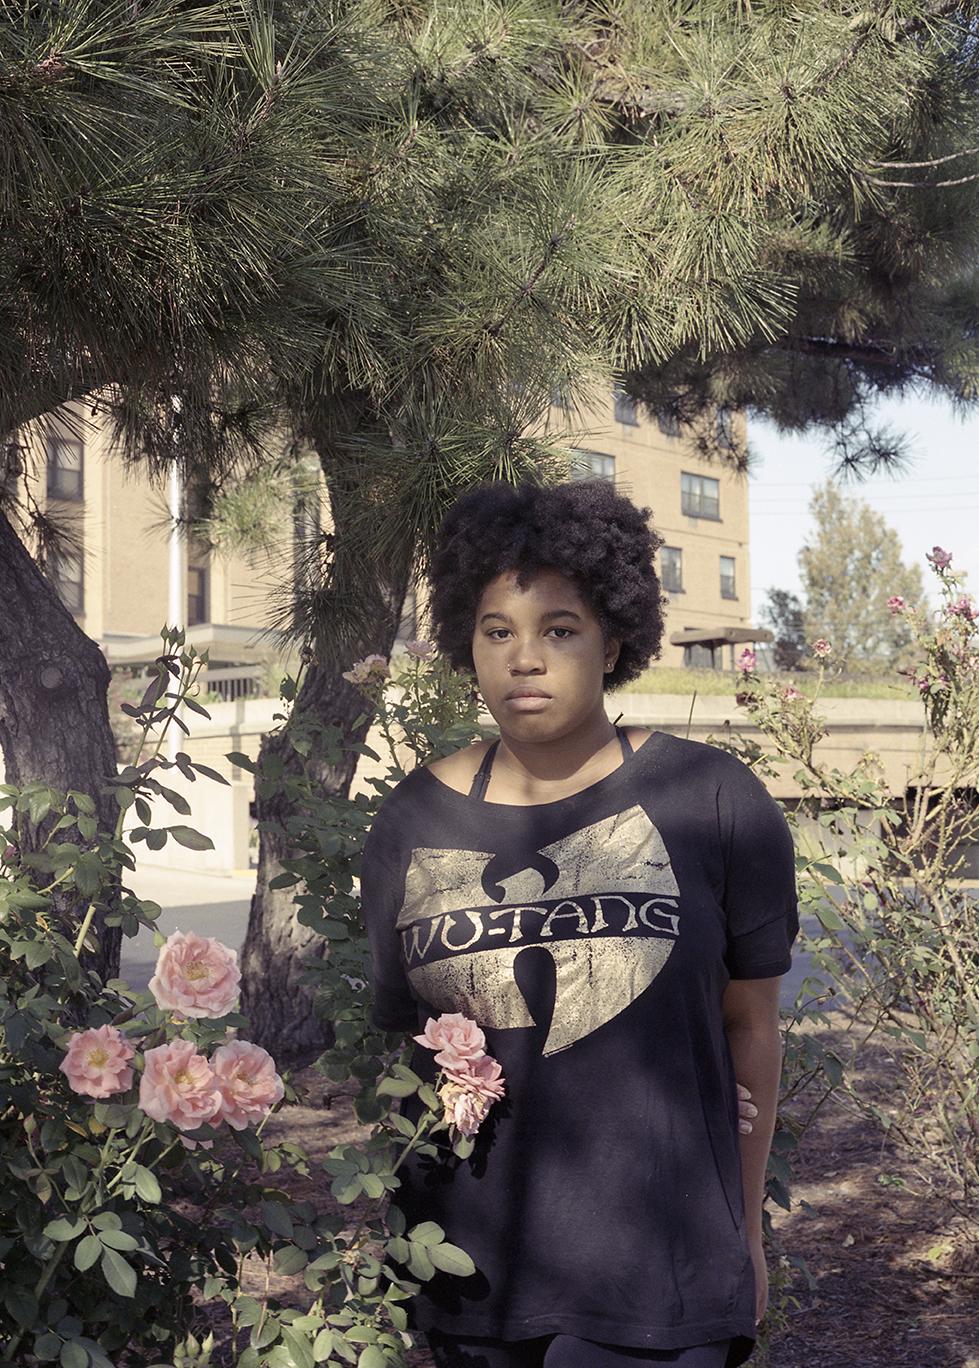 photo by Larissa Ramey